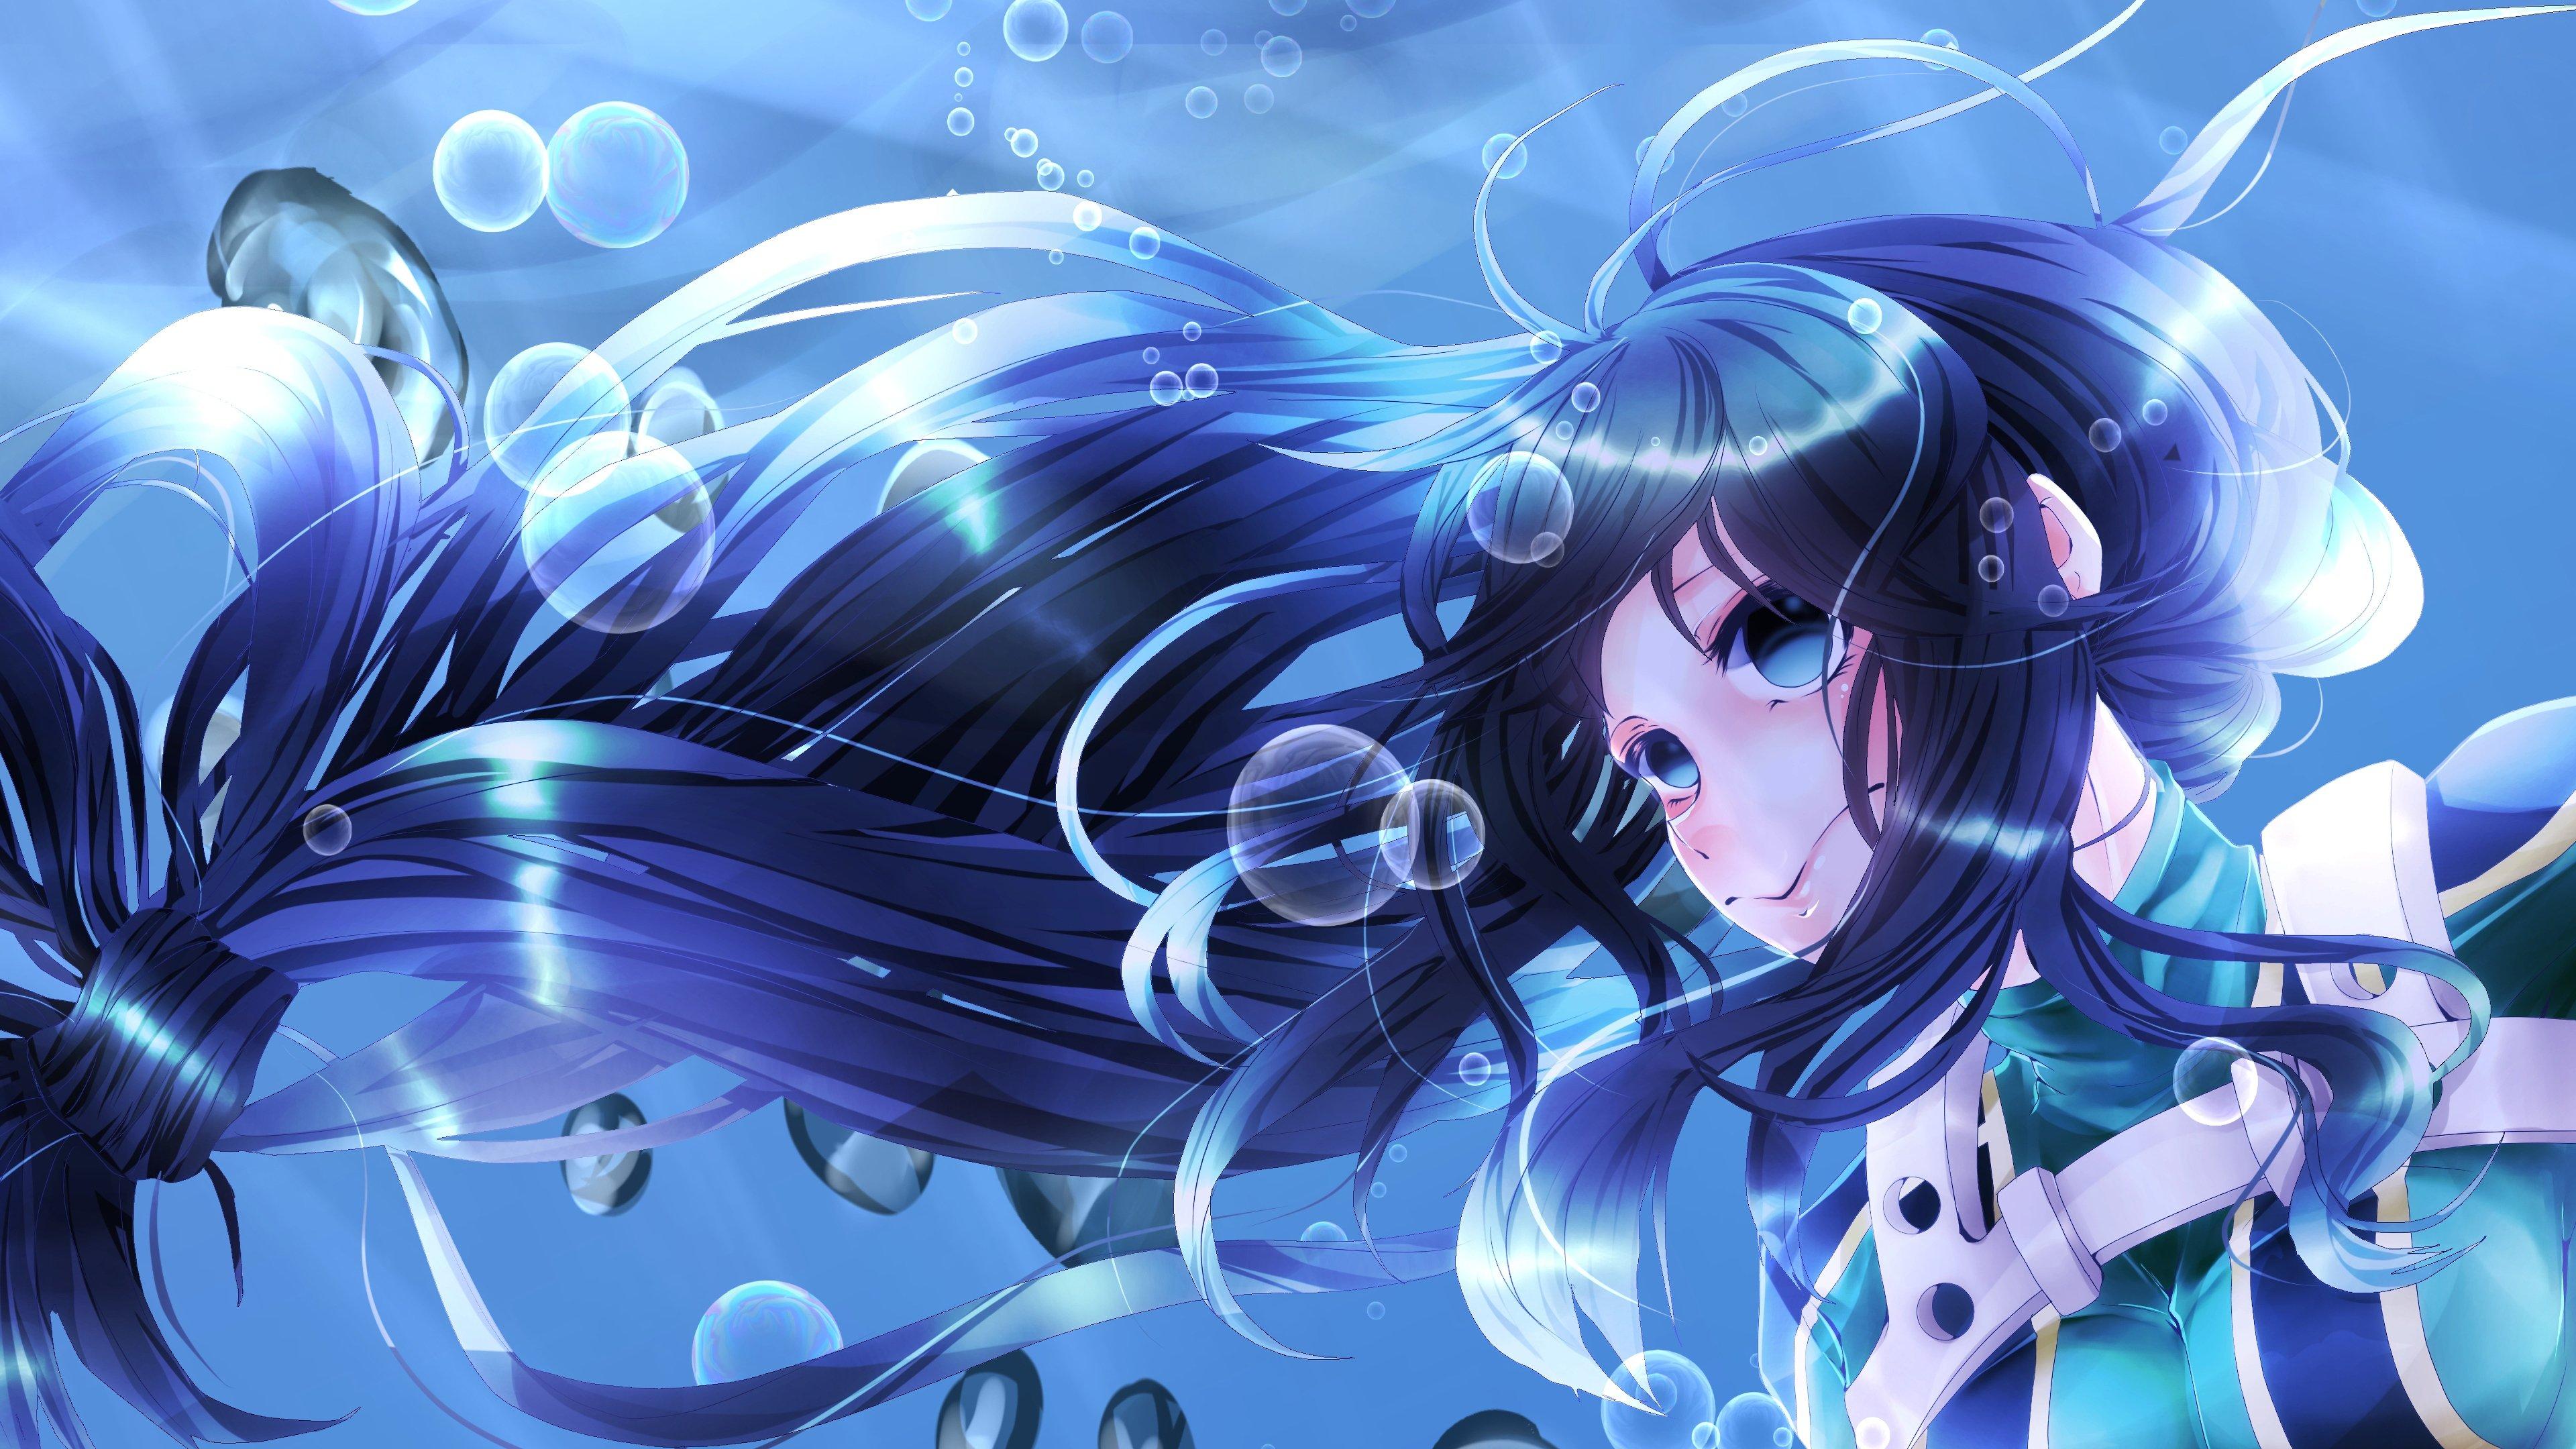 Anime Wallpaper Tsuyu Asui My Hero Academia